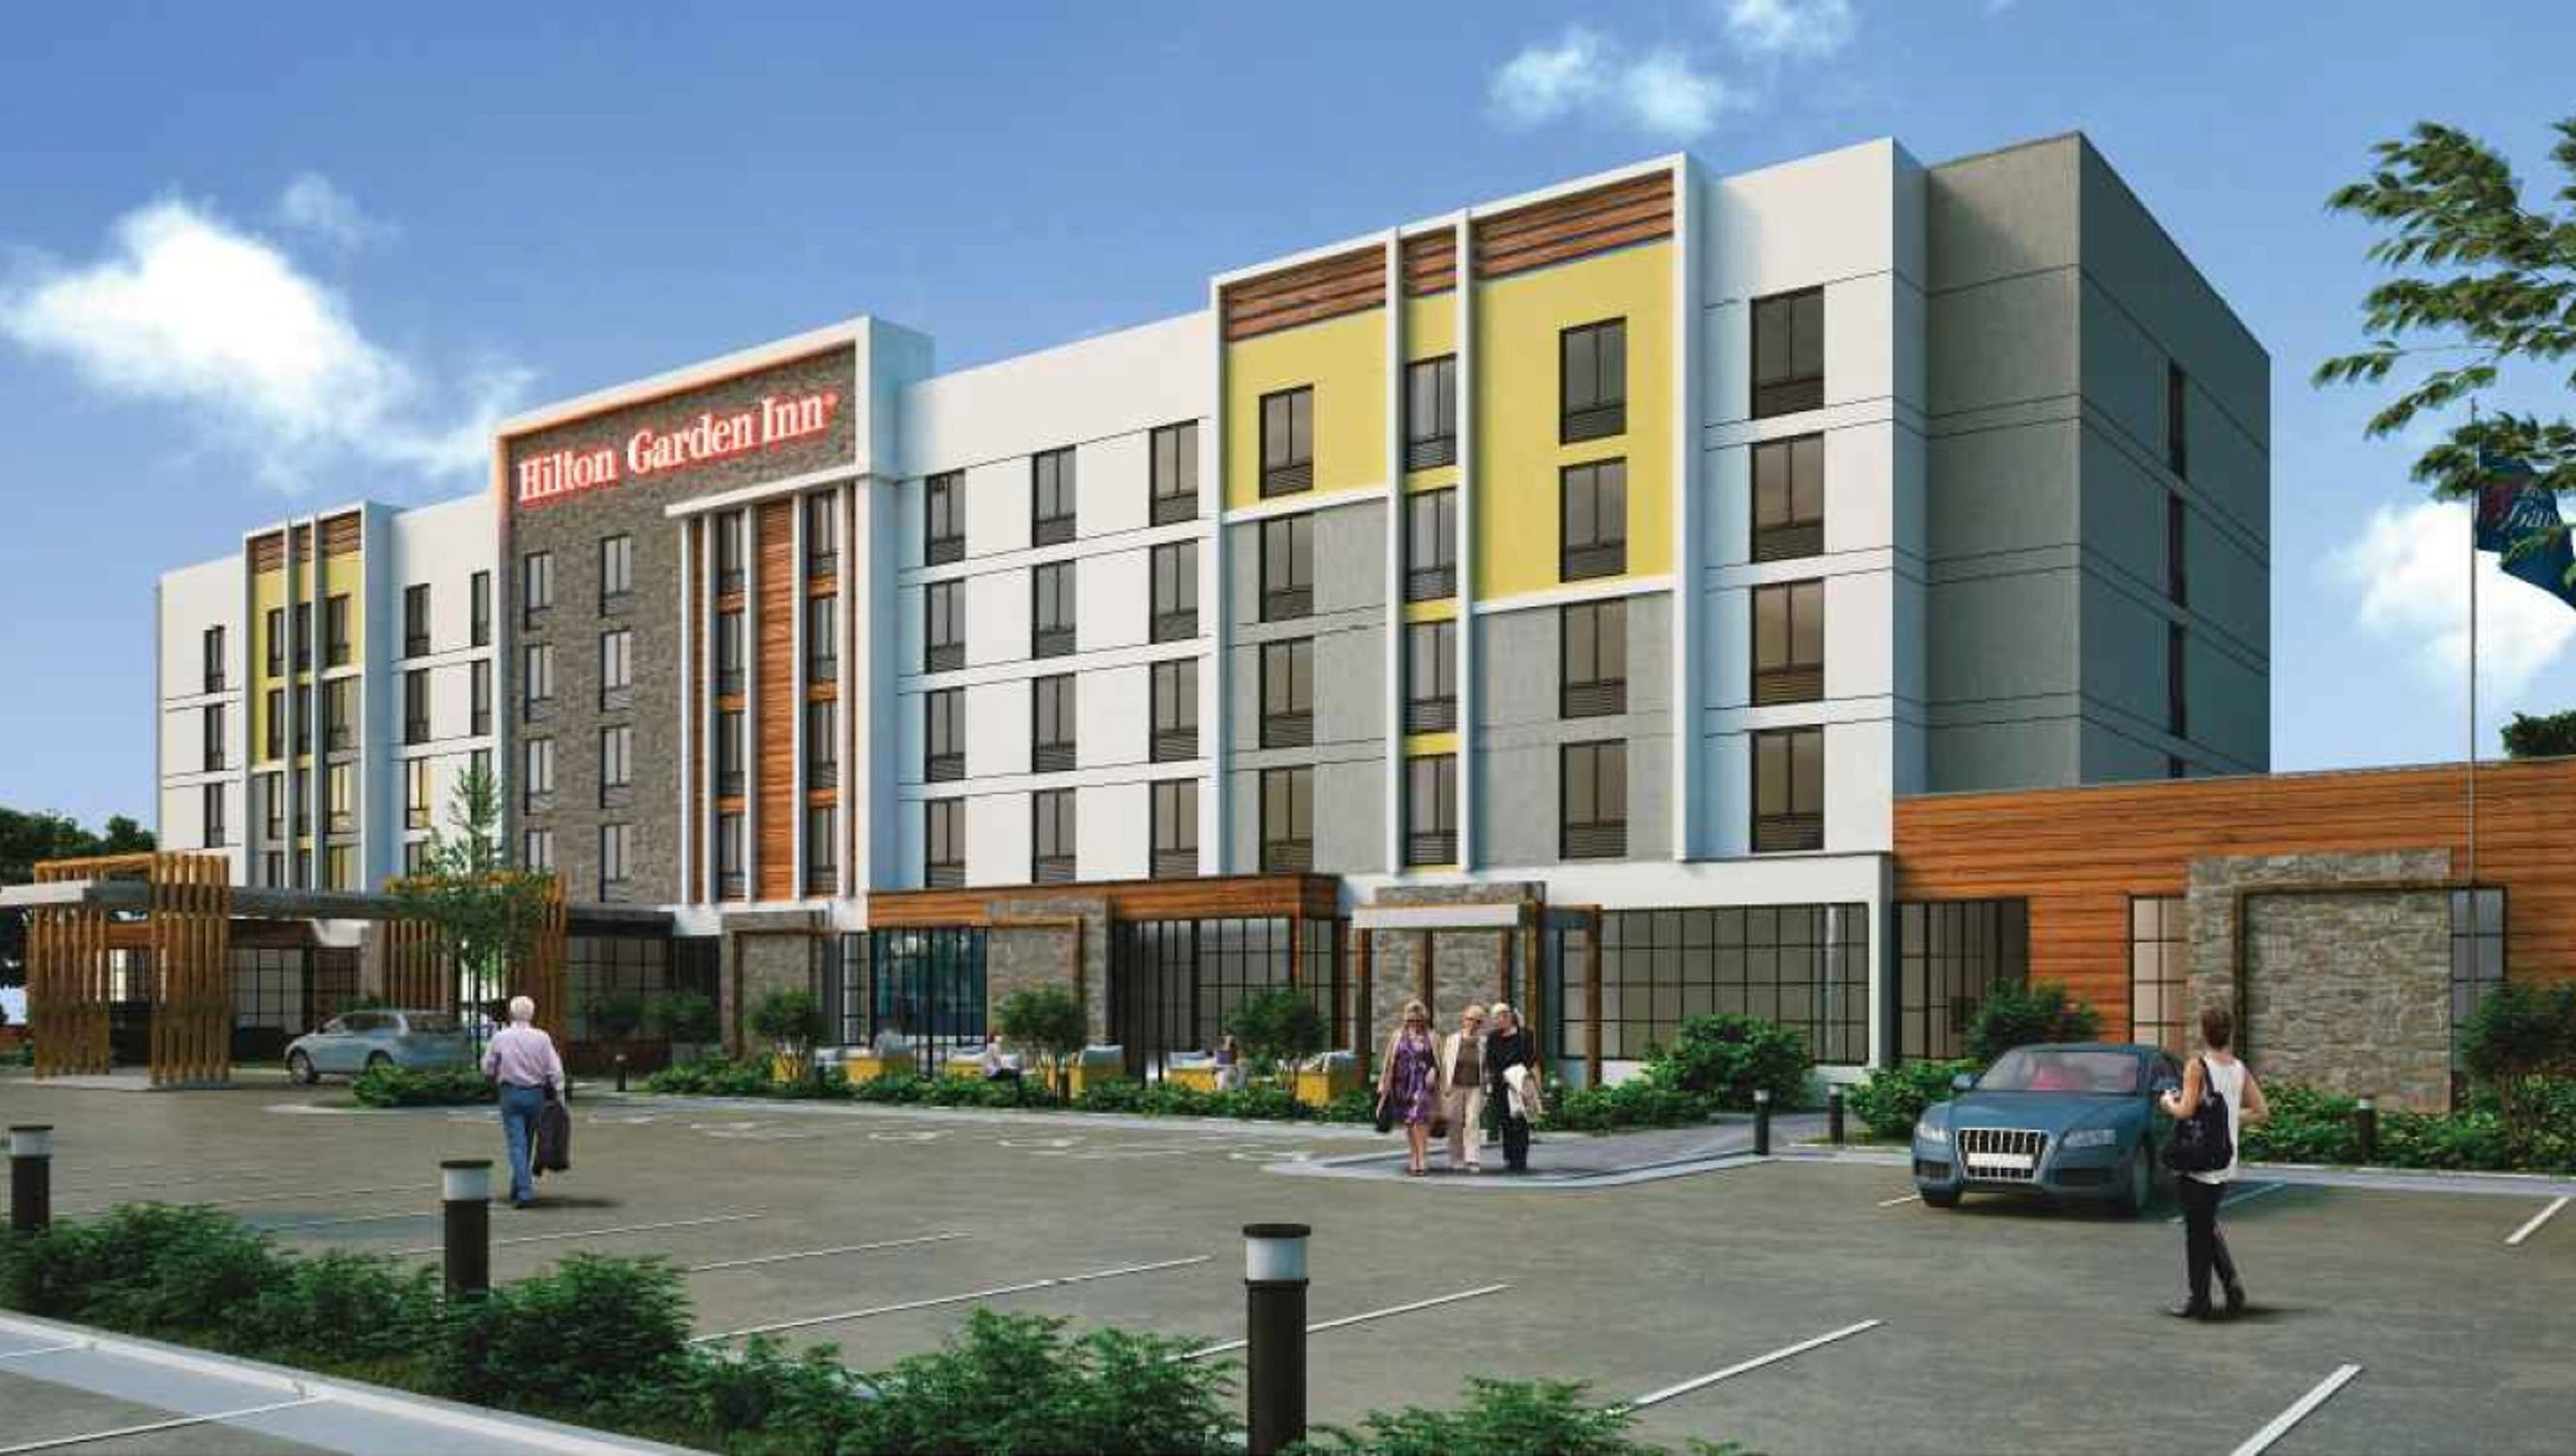 Hilton Garden Inn conference center approved for Gallatin